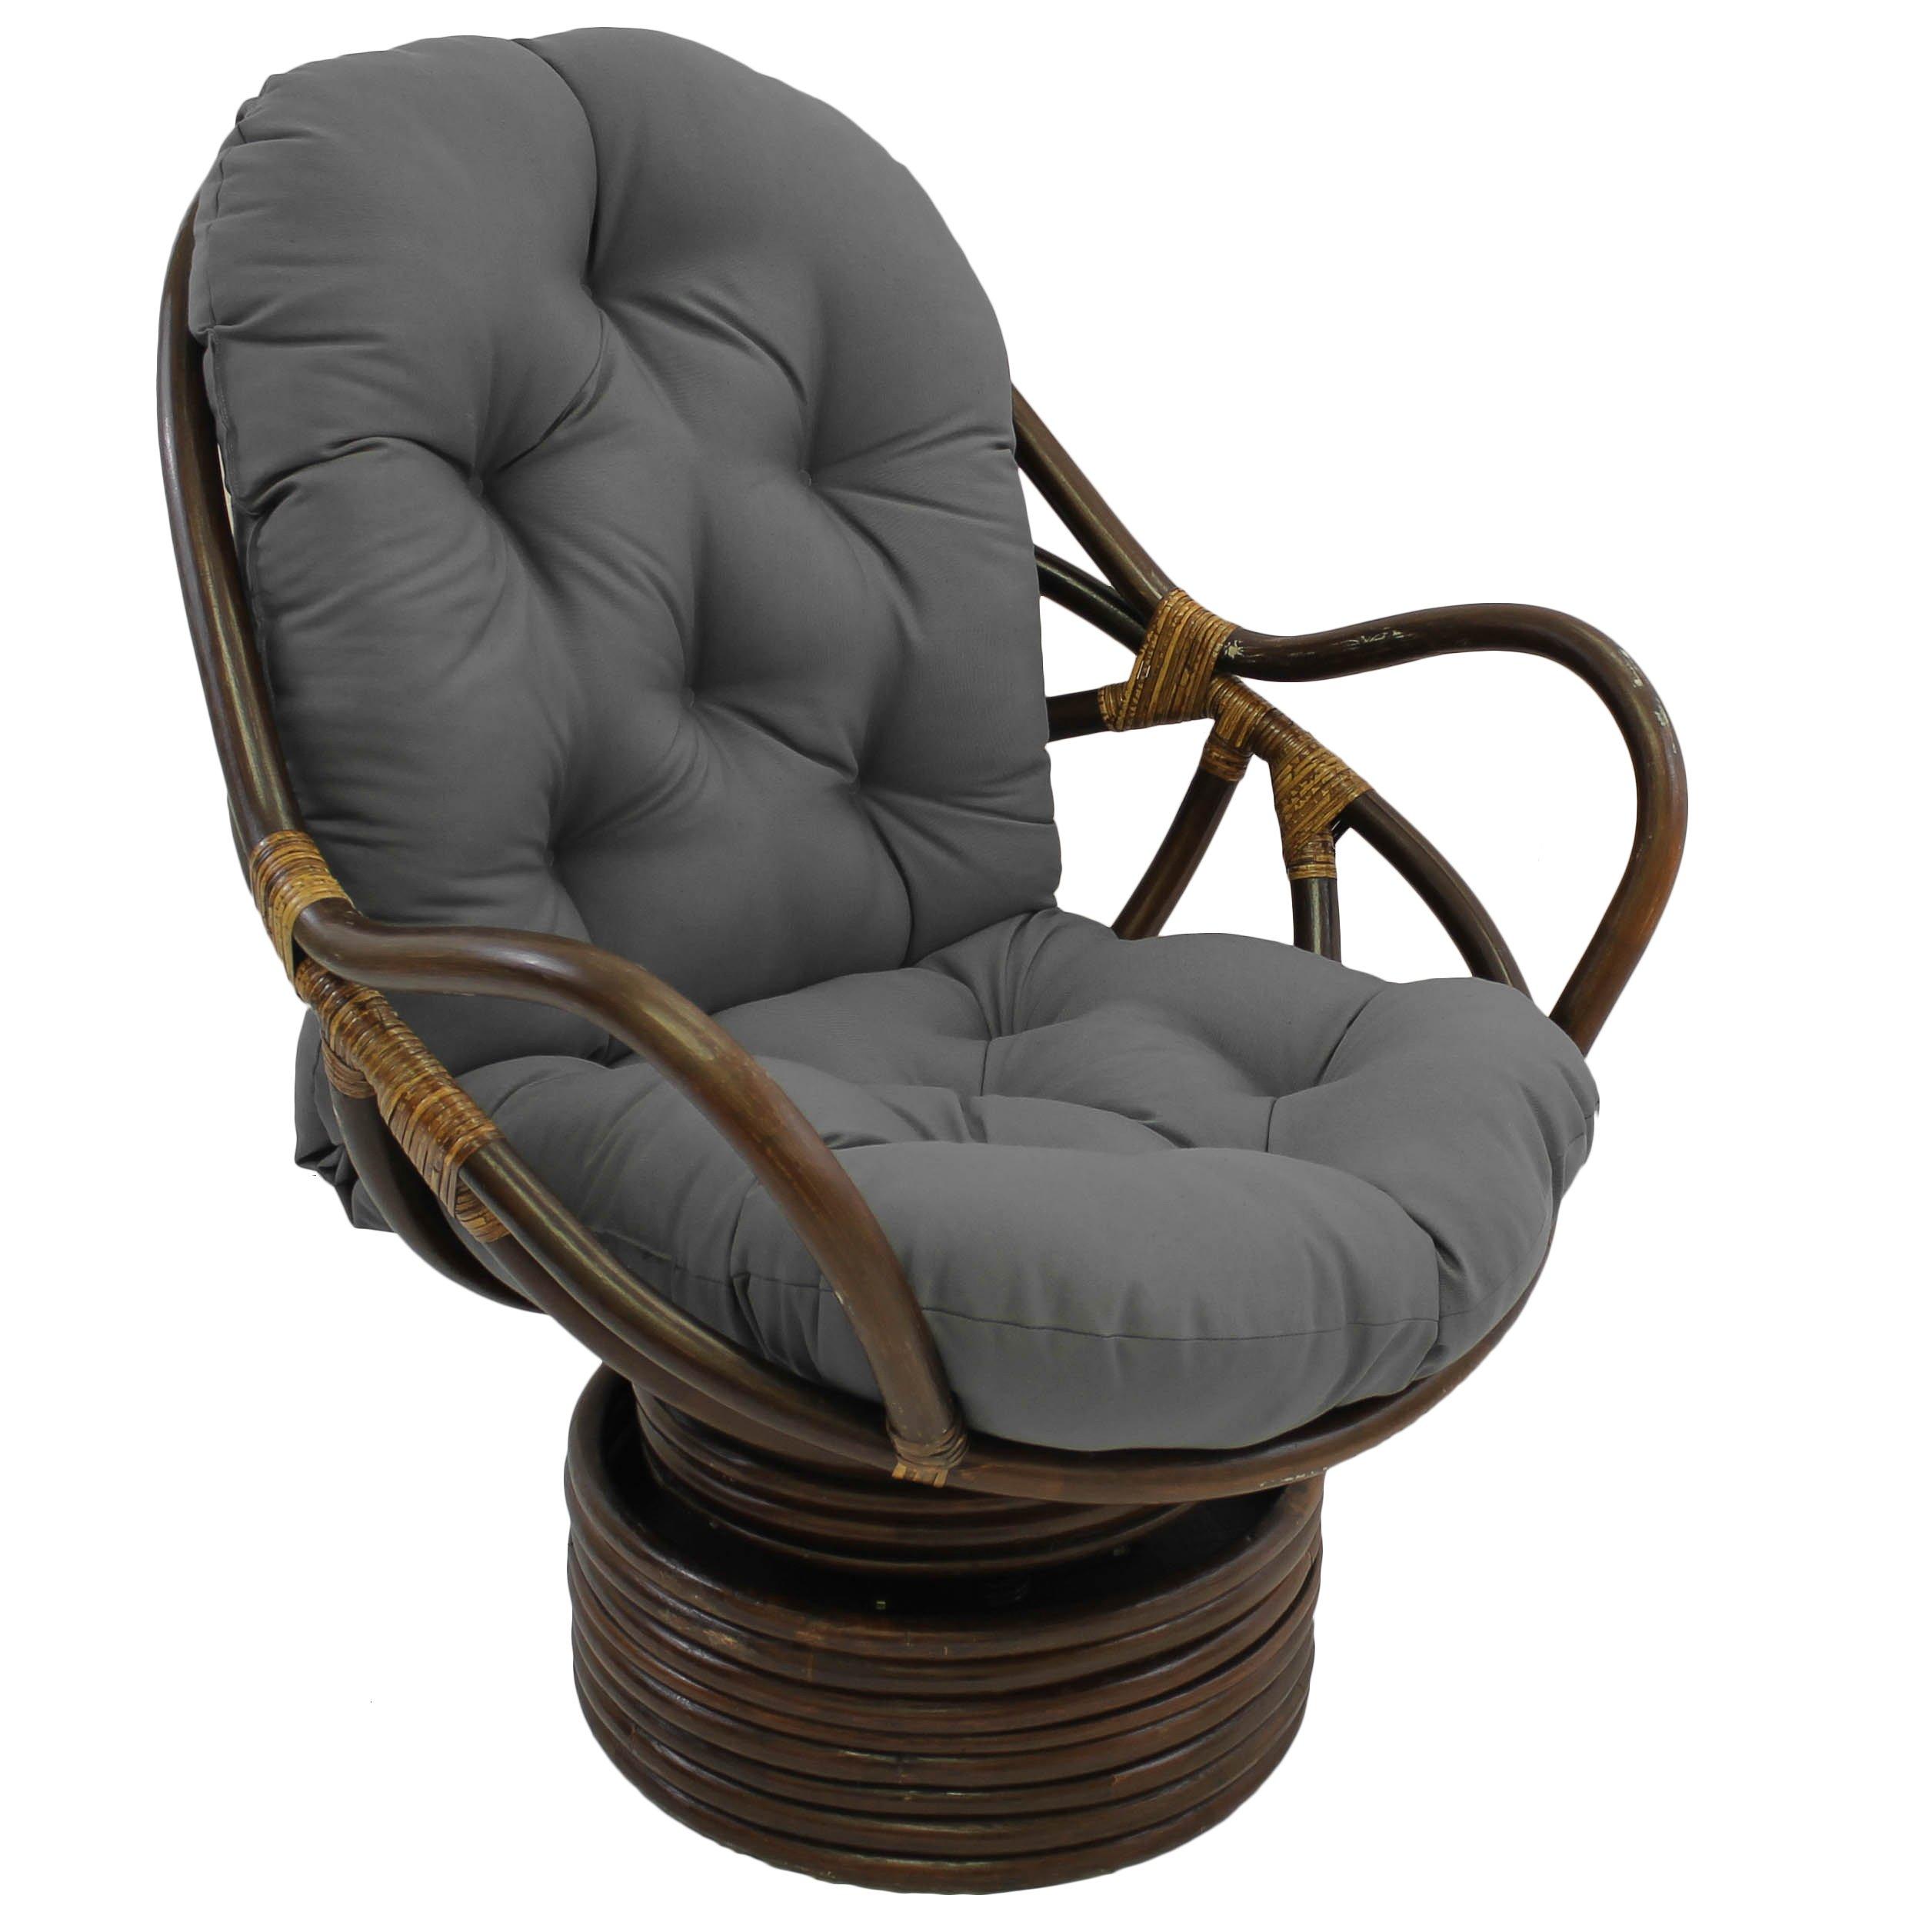 Blazing Needles Solid Twill Swivel Rocker Chair Cushion, 48'' x 24'', Steel Grey